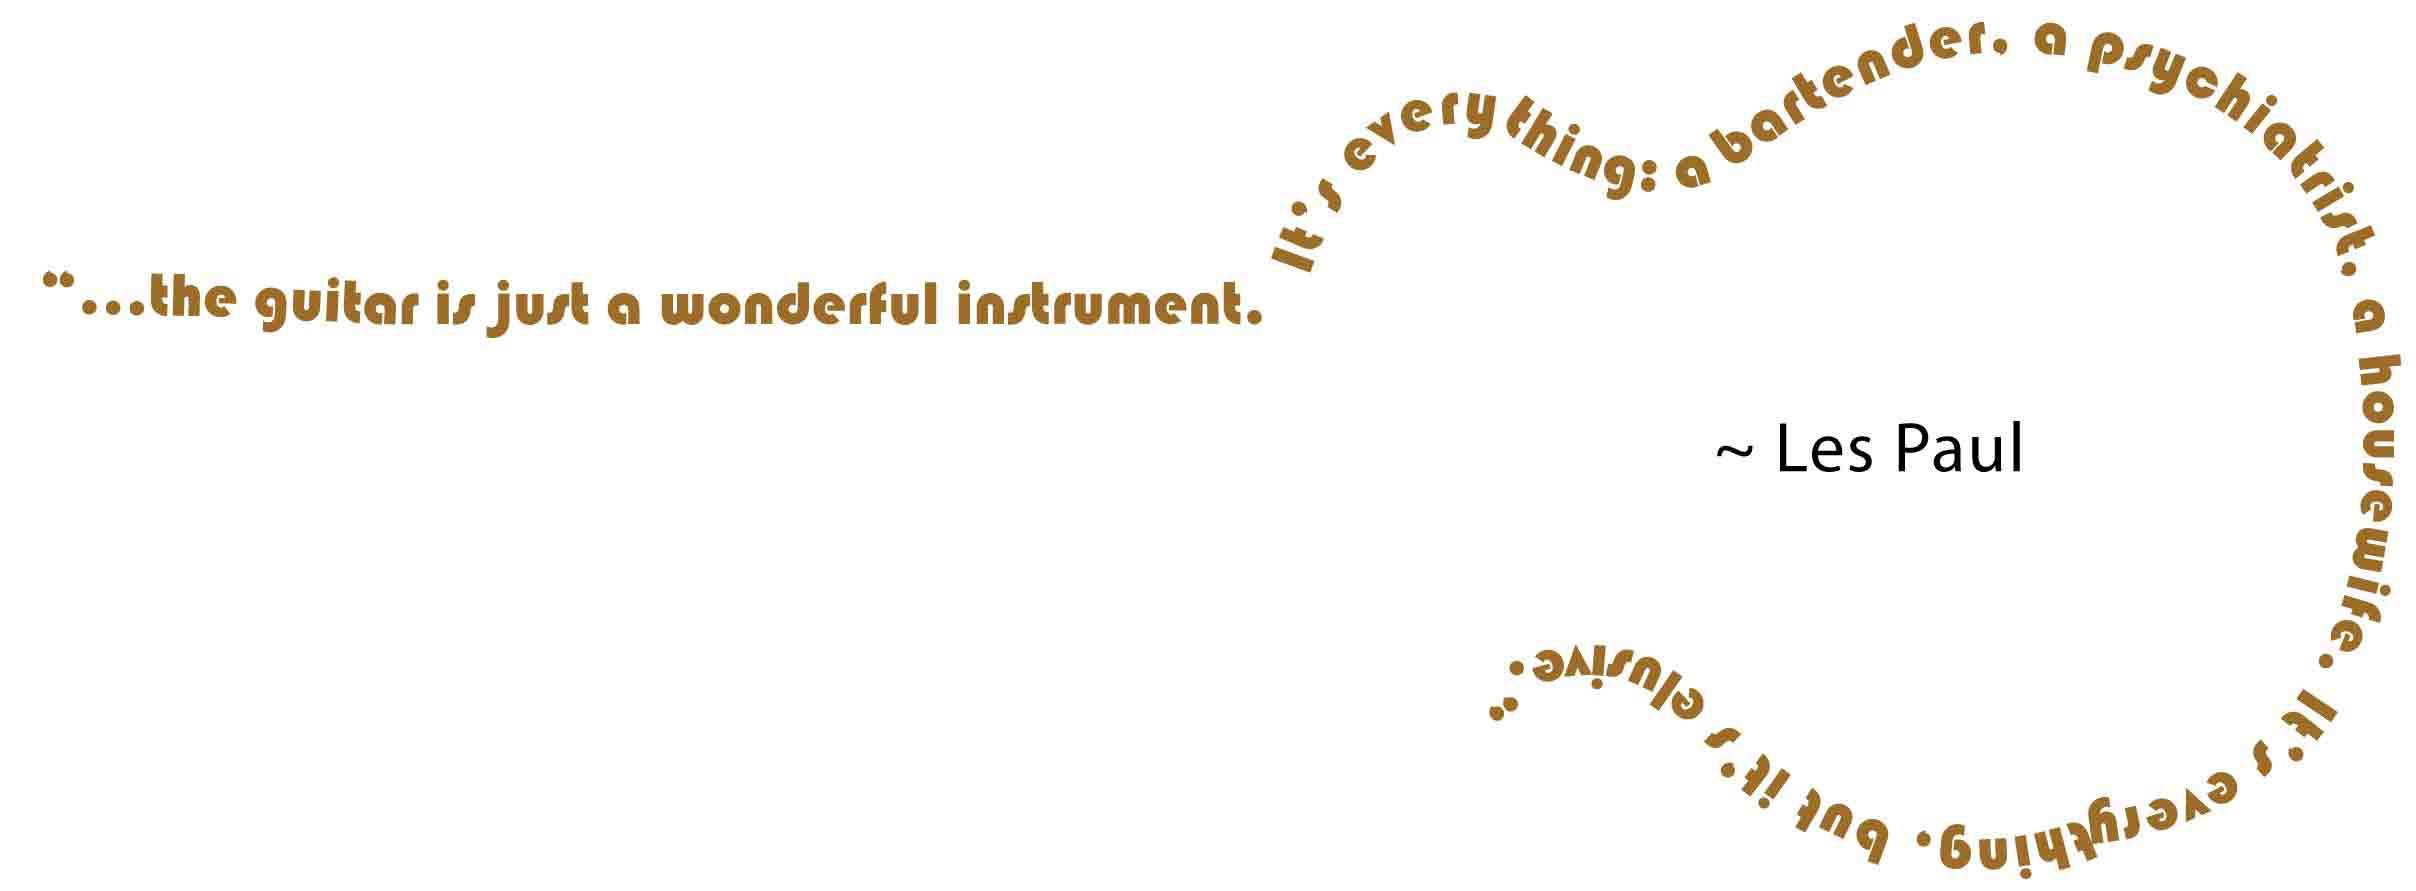 Les Paul's quote #1